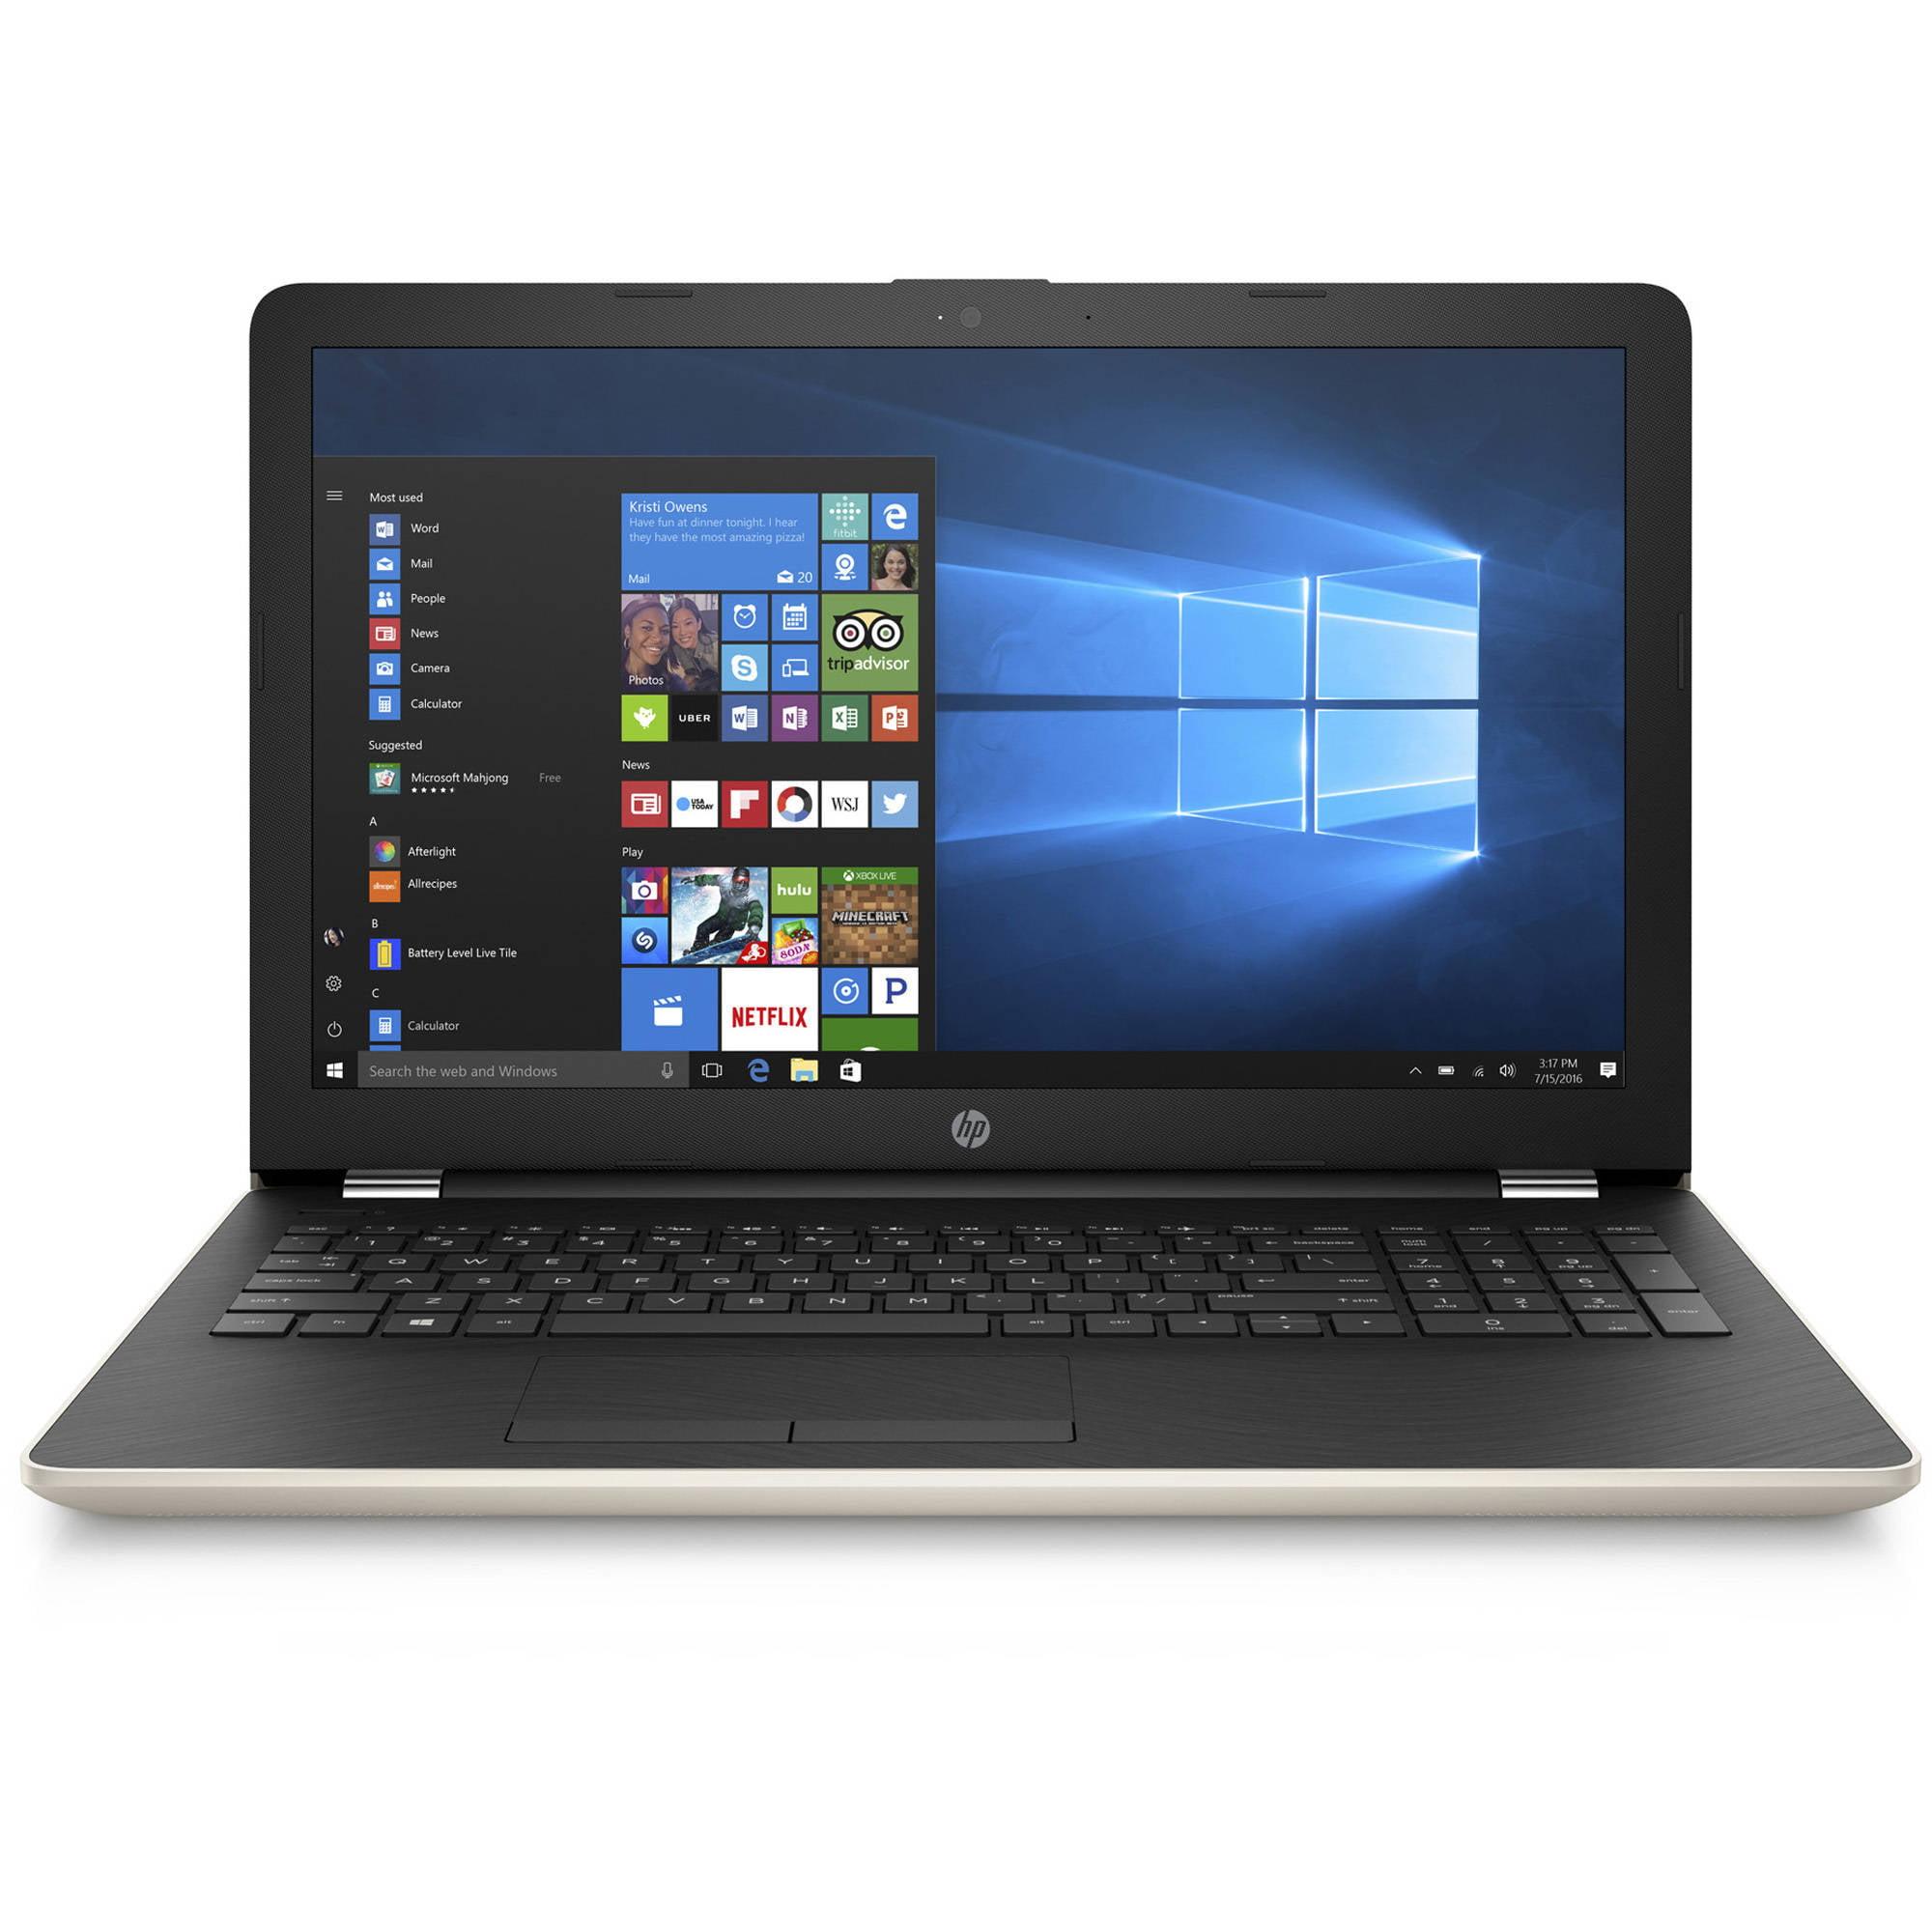 "HP 15-Bw071Nr 15.6"" Laptop, Windows 10 Home, AMD A9-9420 Dual-Core Processor, 4GB RAM, 1TB Hard Drive"